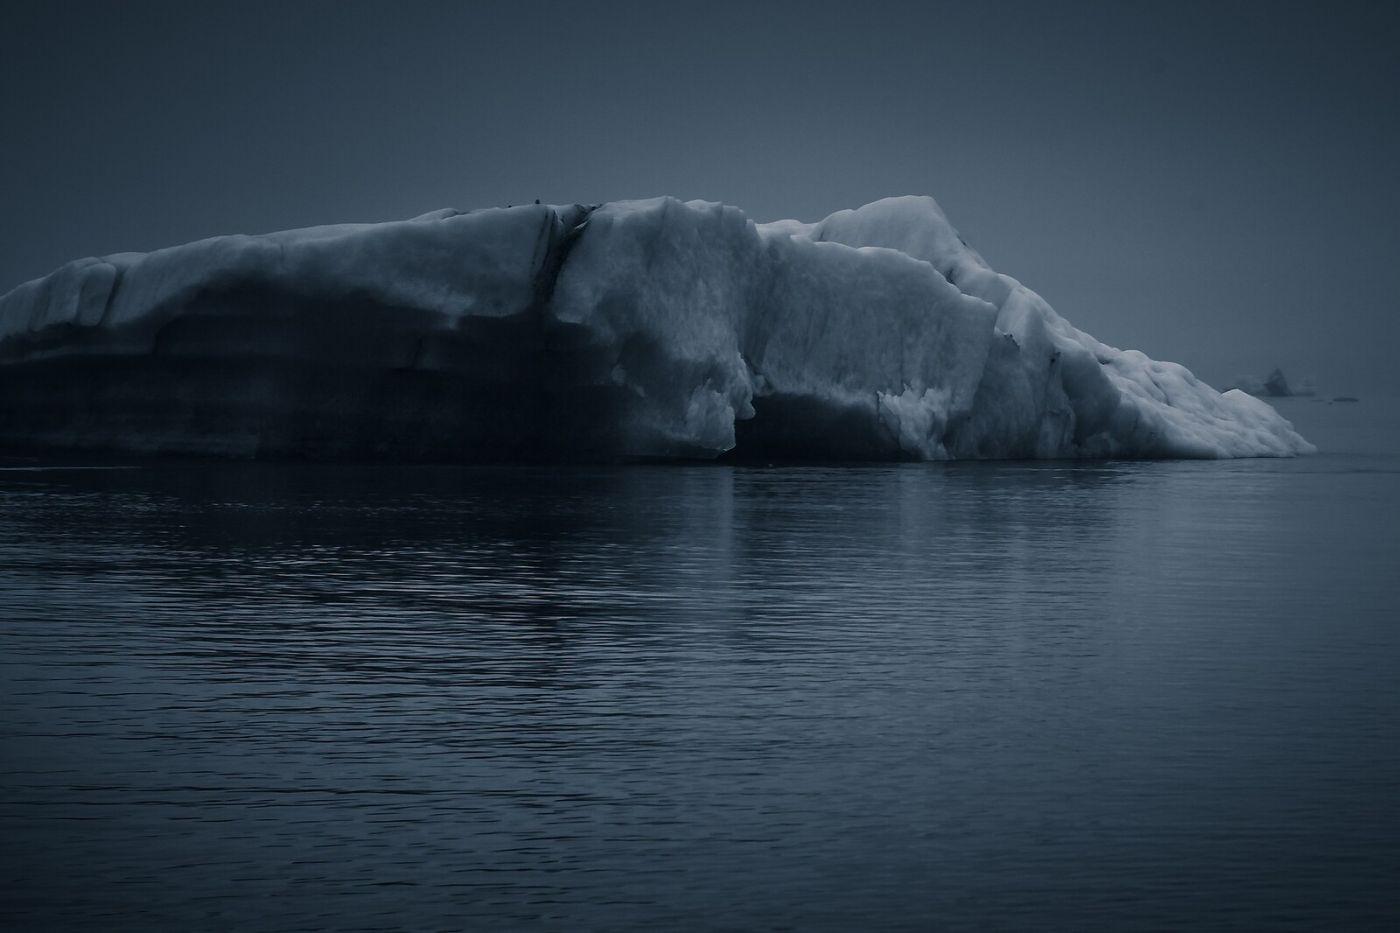 冰岛冰川泻湖(Glacier Lagoon),流动的冰川_图1-19